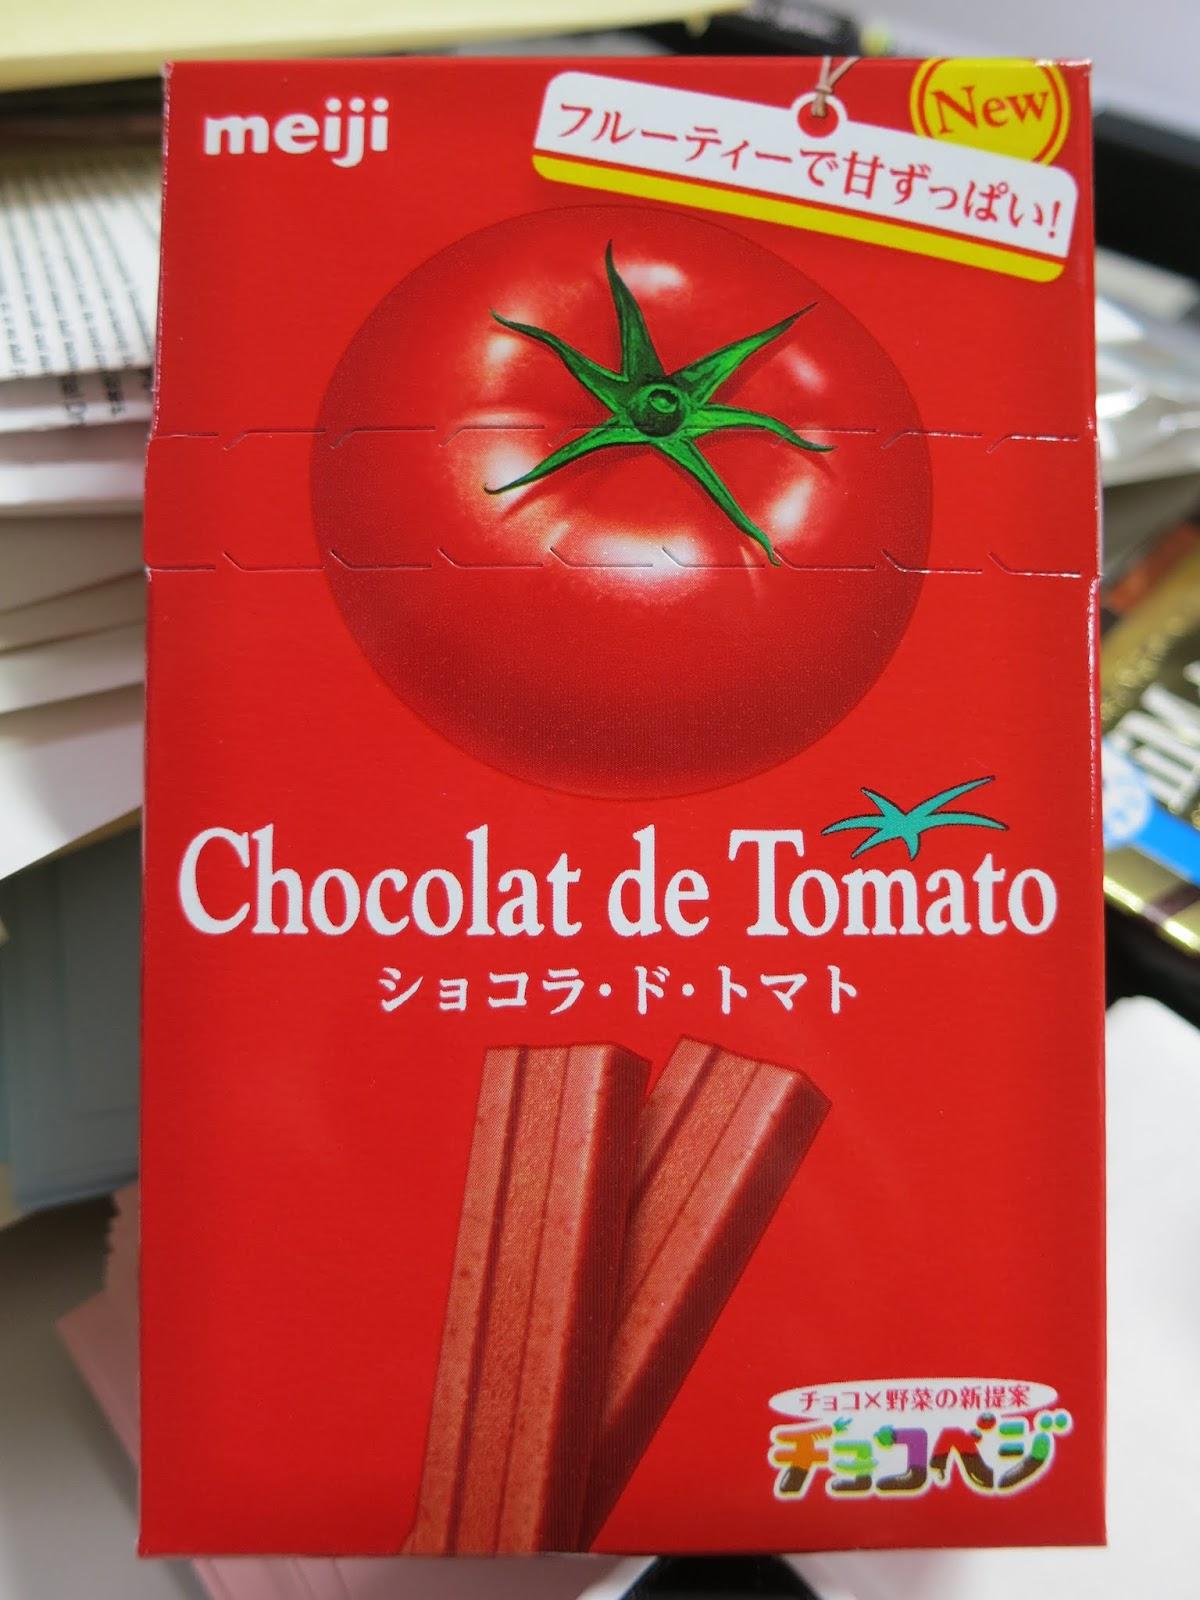 tomato chocolate weird jonas extraordinary sapporo tastes sells coop actually called something still university well